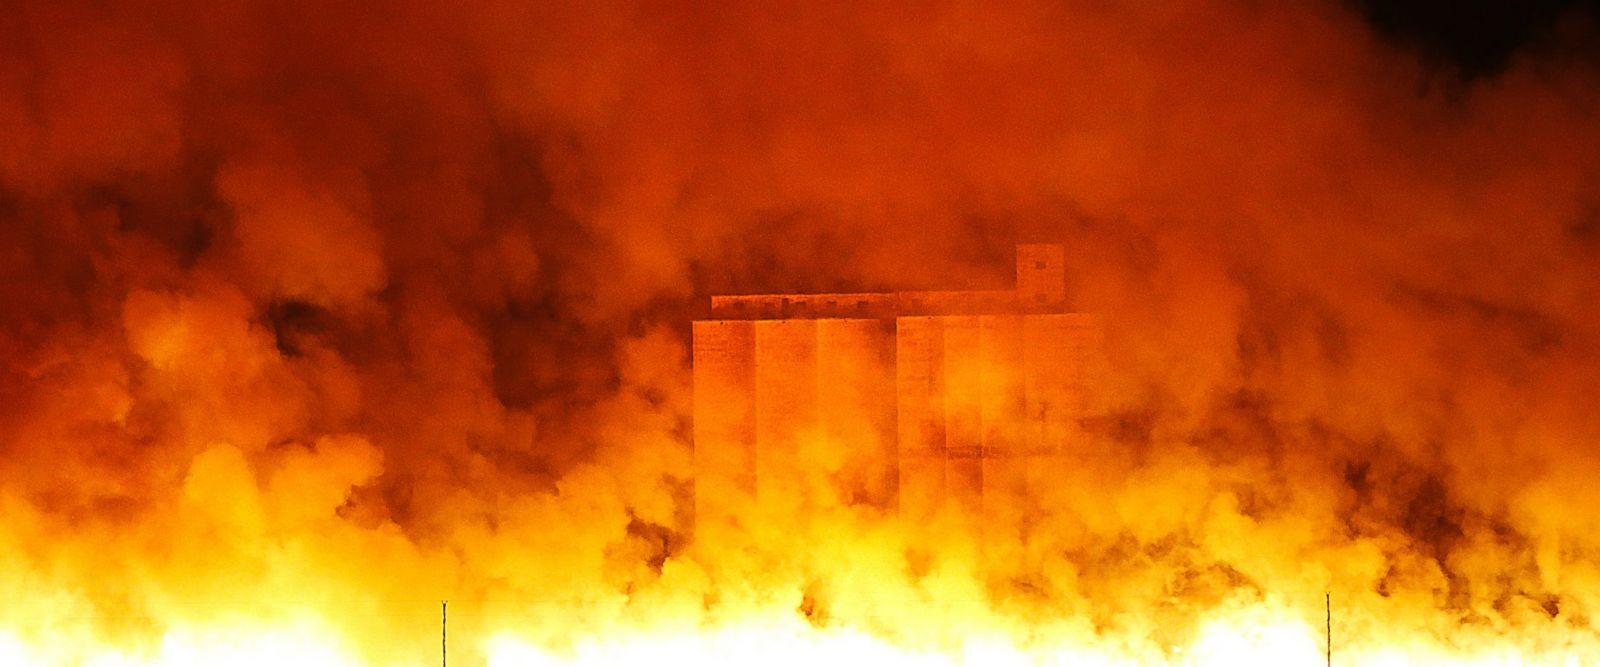 Cattle, Wildlife, Suffer in Kansas Fires